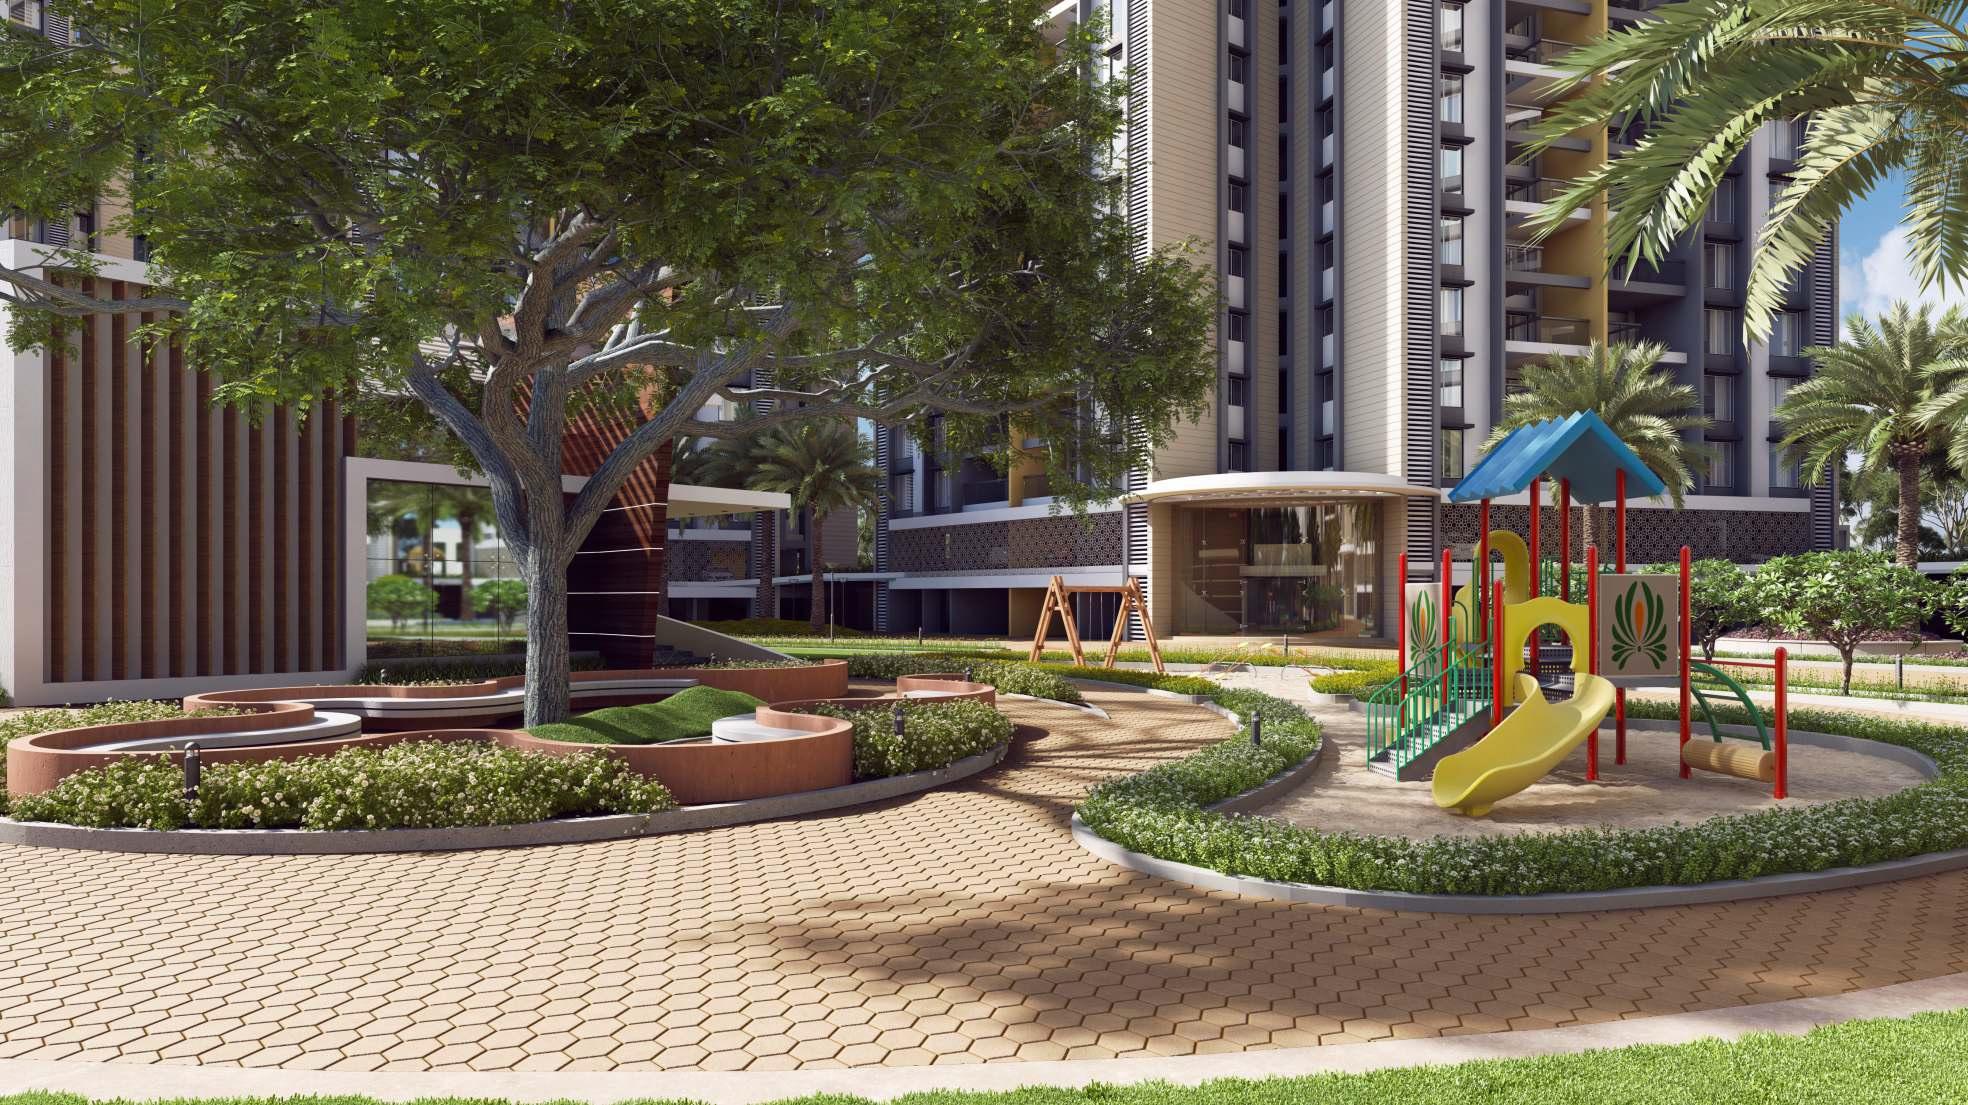 rama melange residences amenities features3